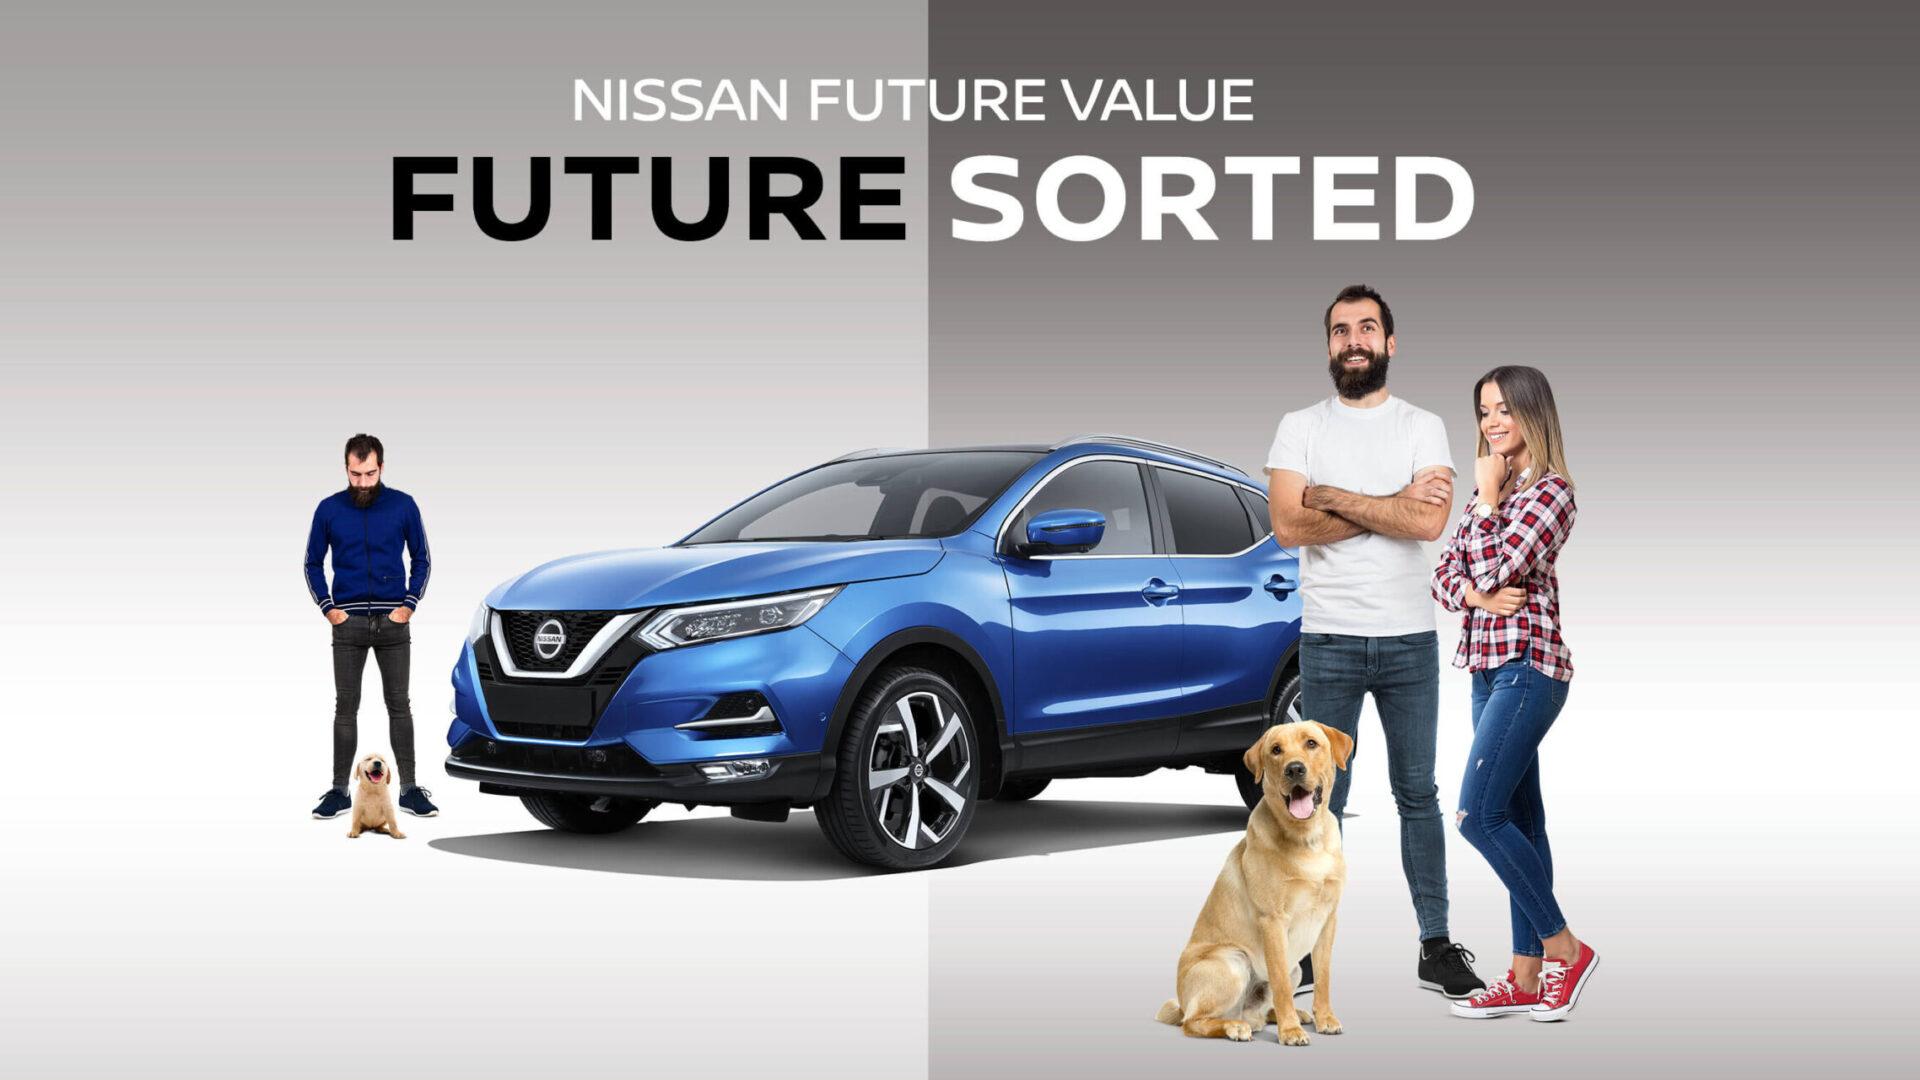 Nissan-Future-Value-Image-scaled